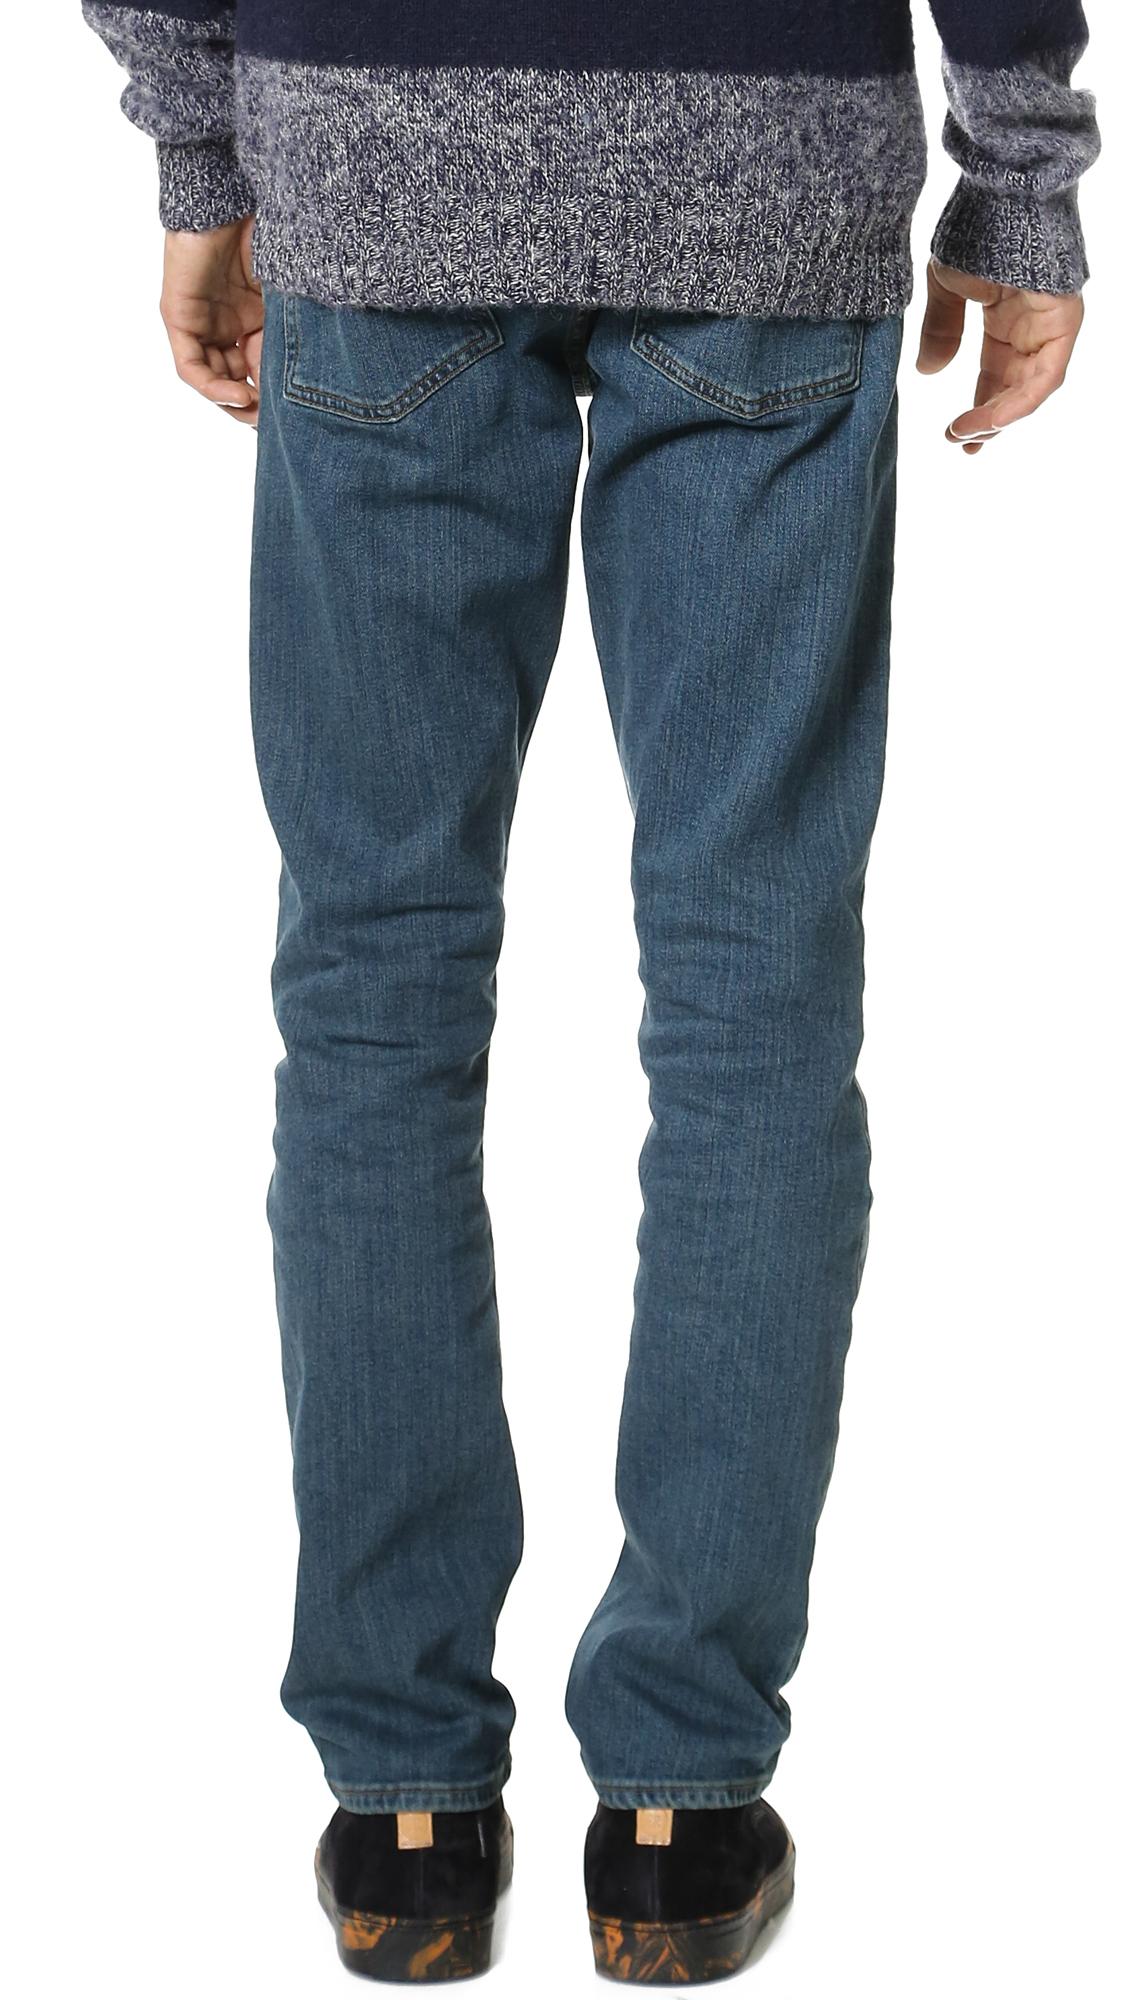 RVCA Denim Daggers Slim Fit Jeans in Vintage Blue (Blue) for Men